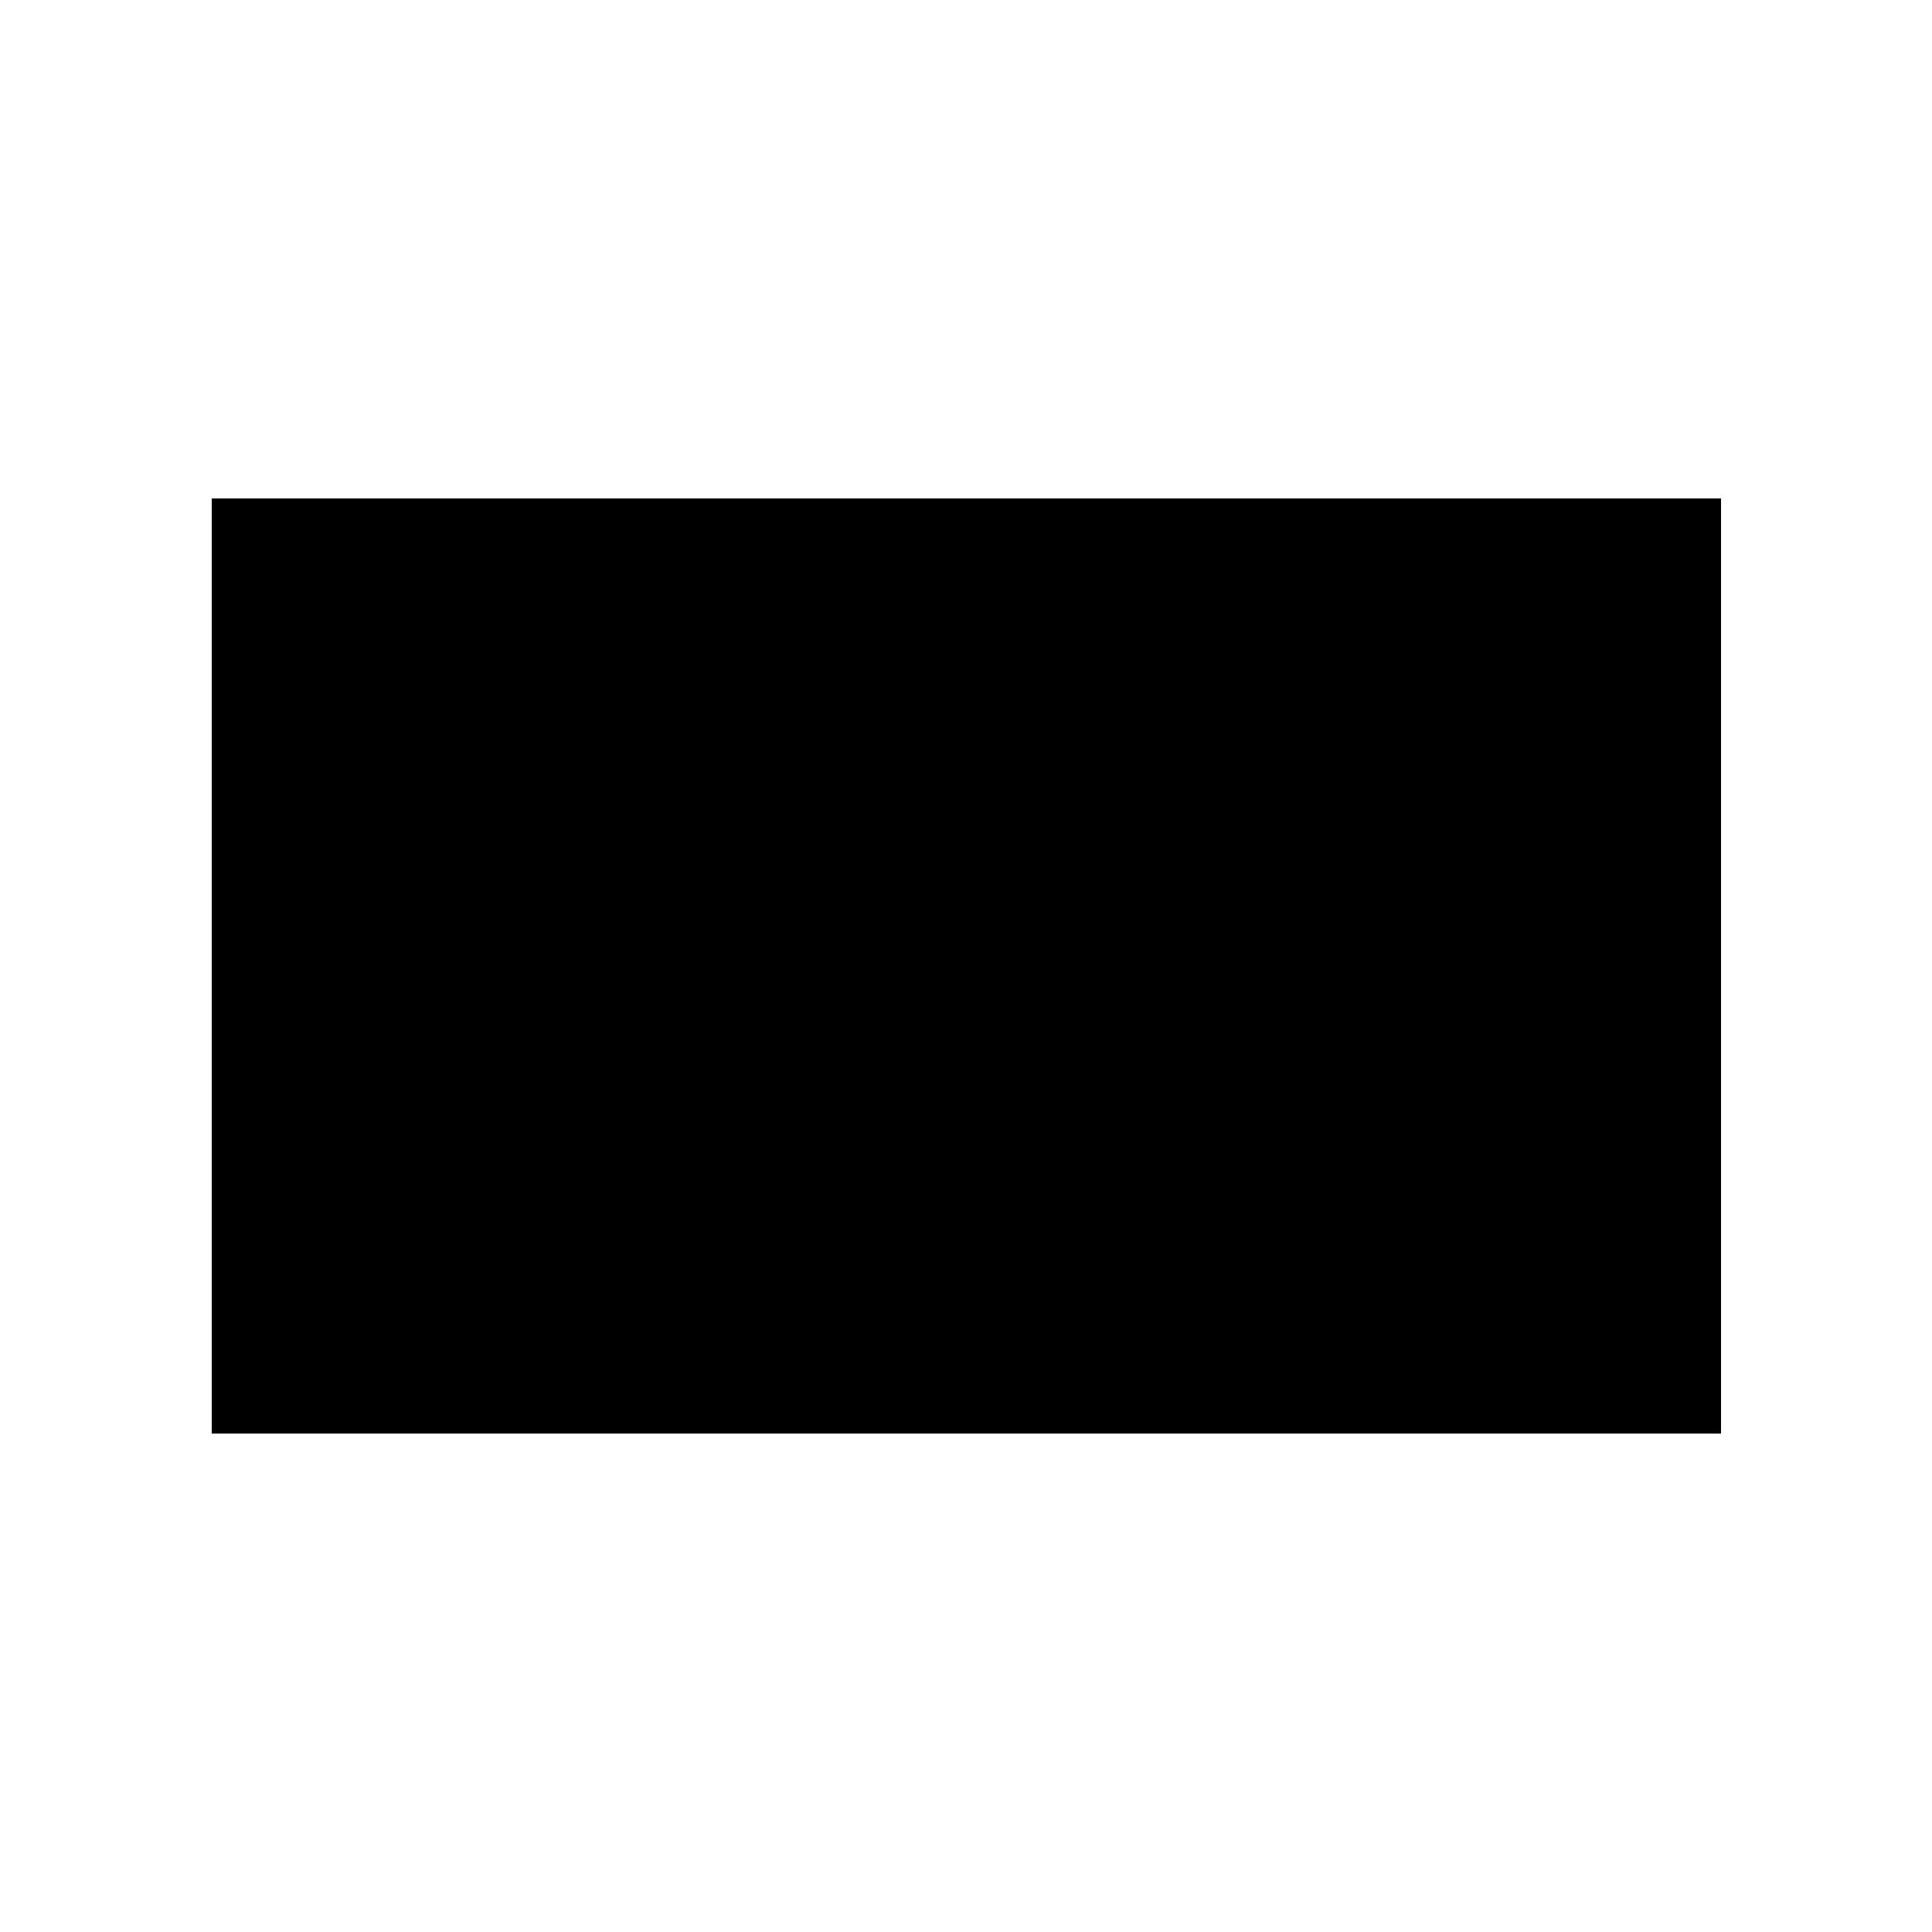 indo_standard_02 (1).png